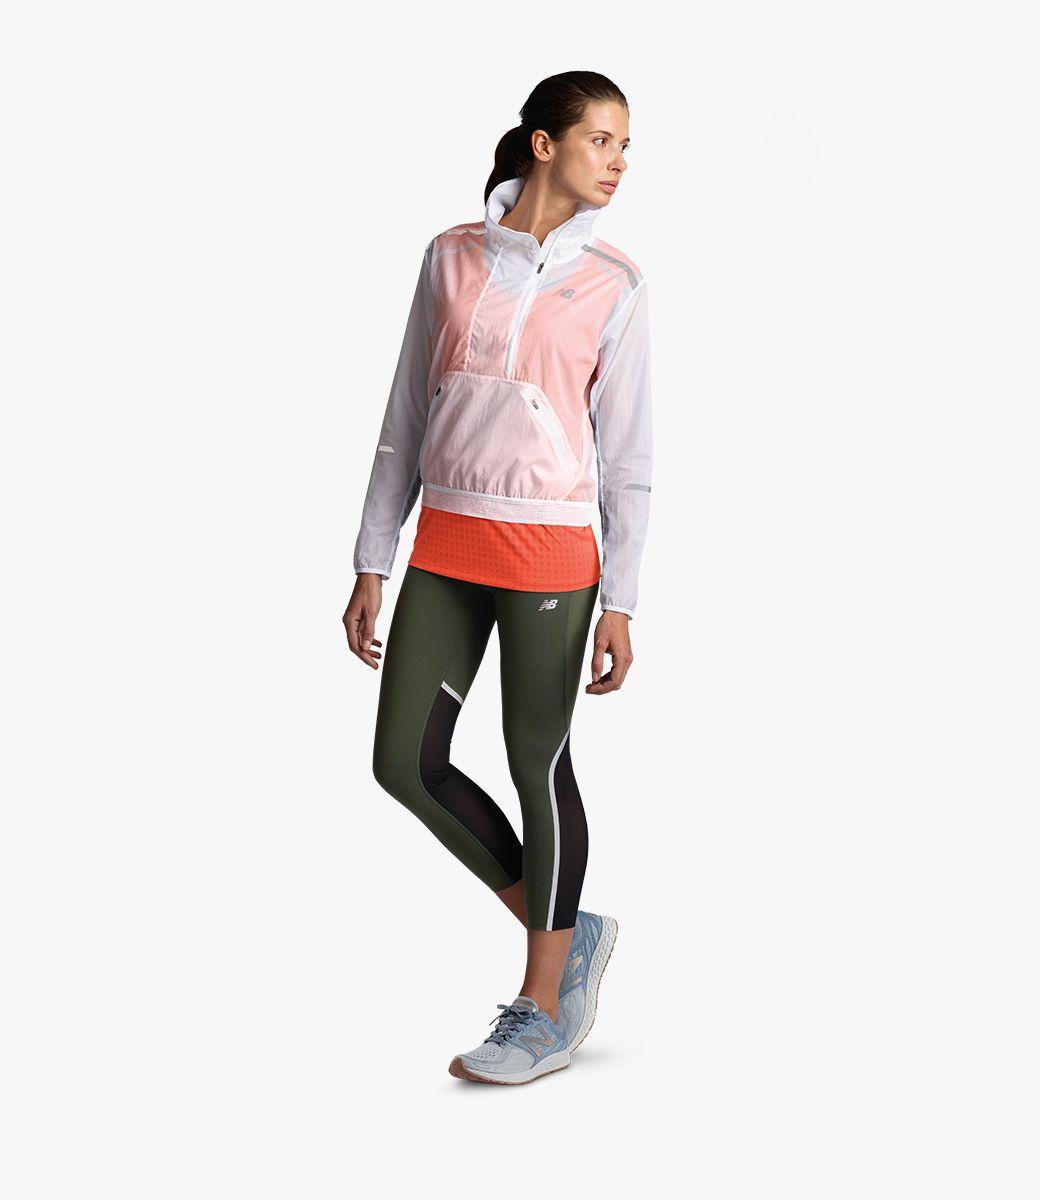 New Balance US Womens March Fresh Foam Zante and D2D Run,